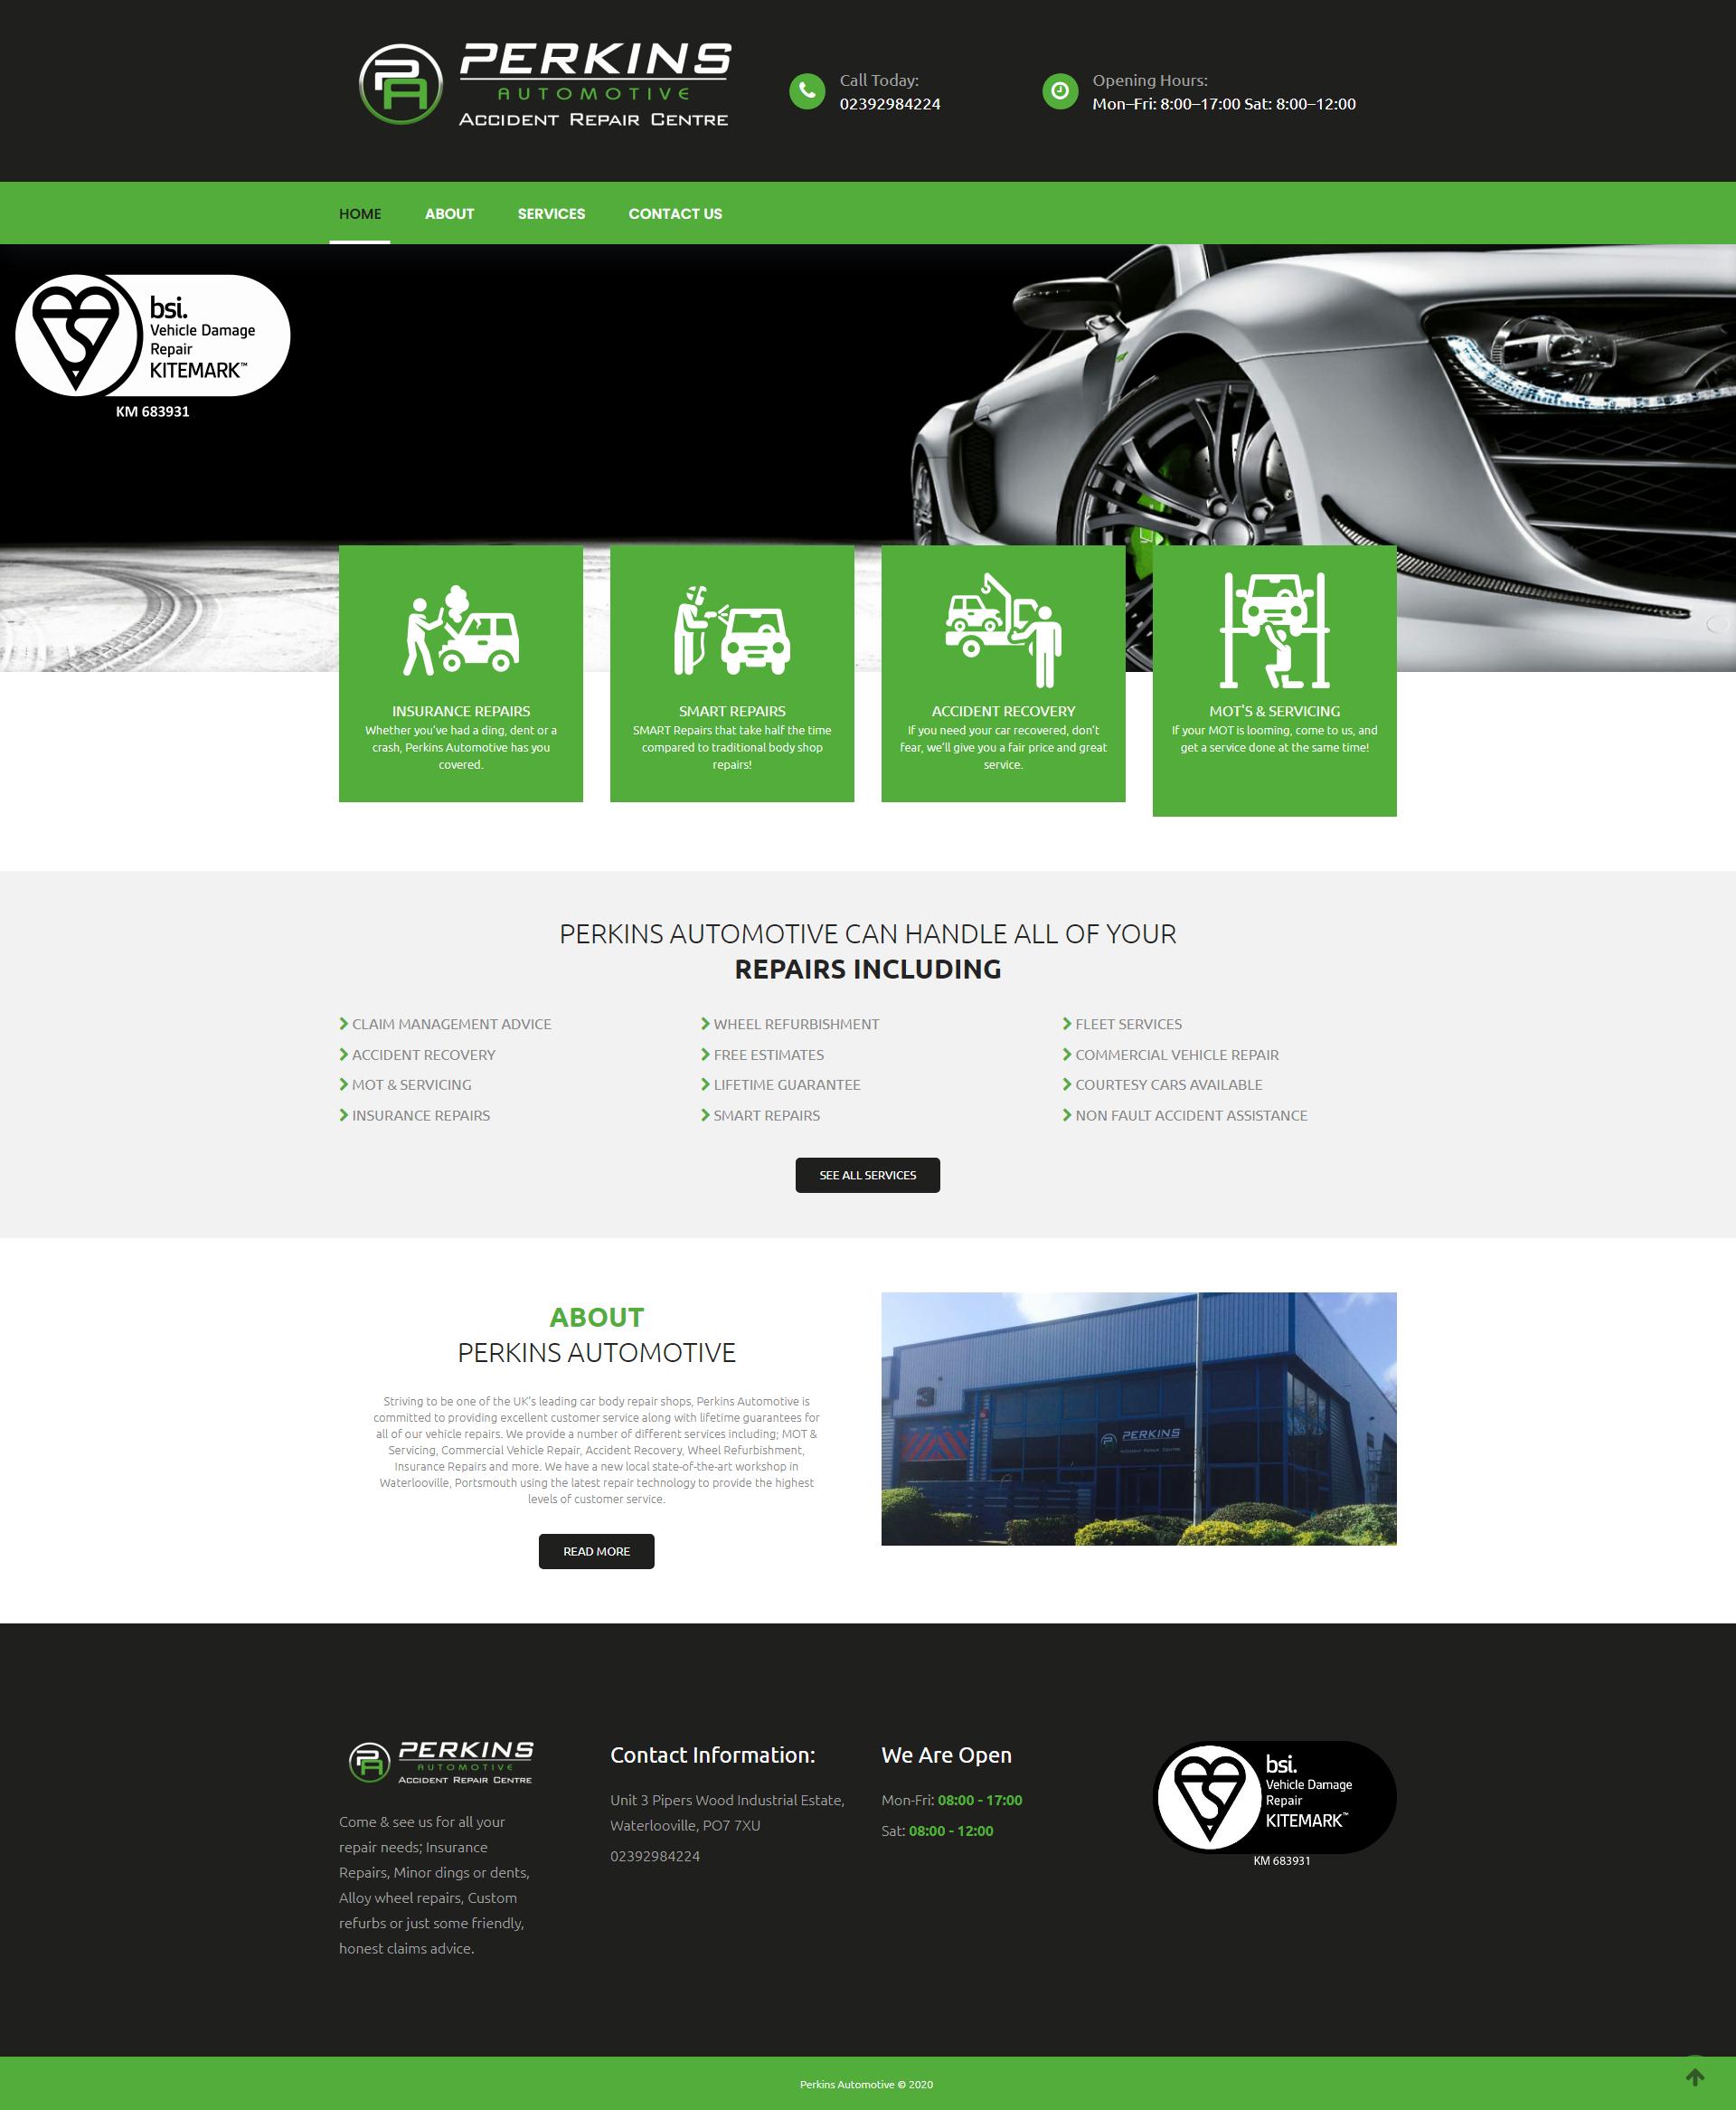 Perkins Auto Website Designed by Carrera UK